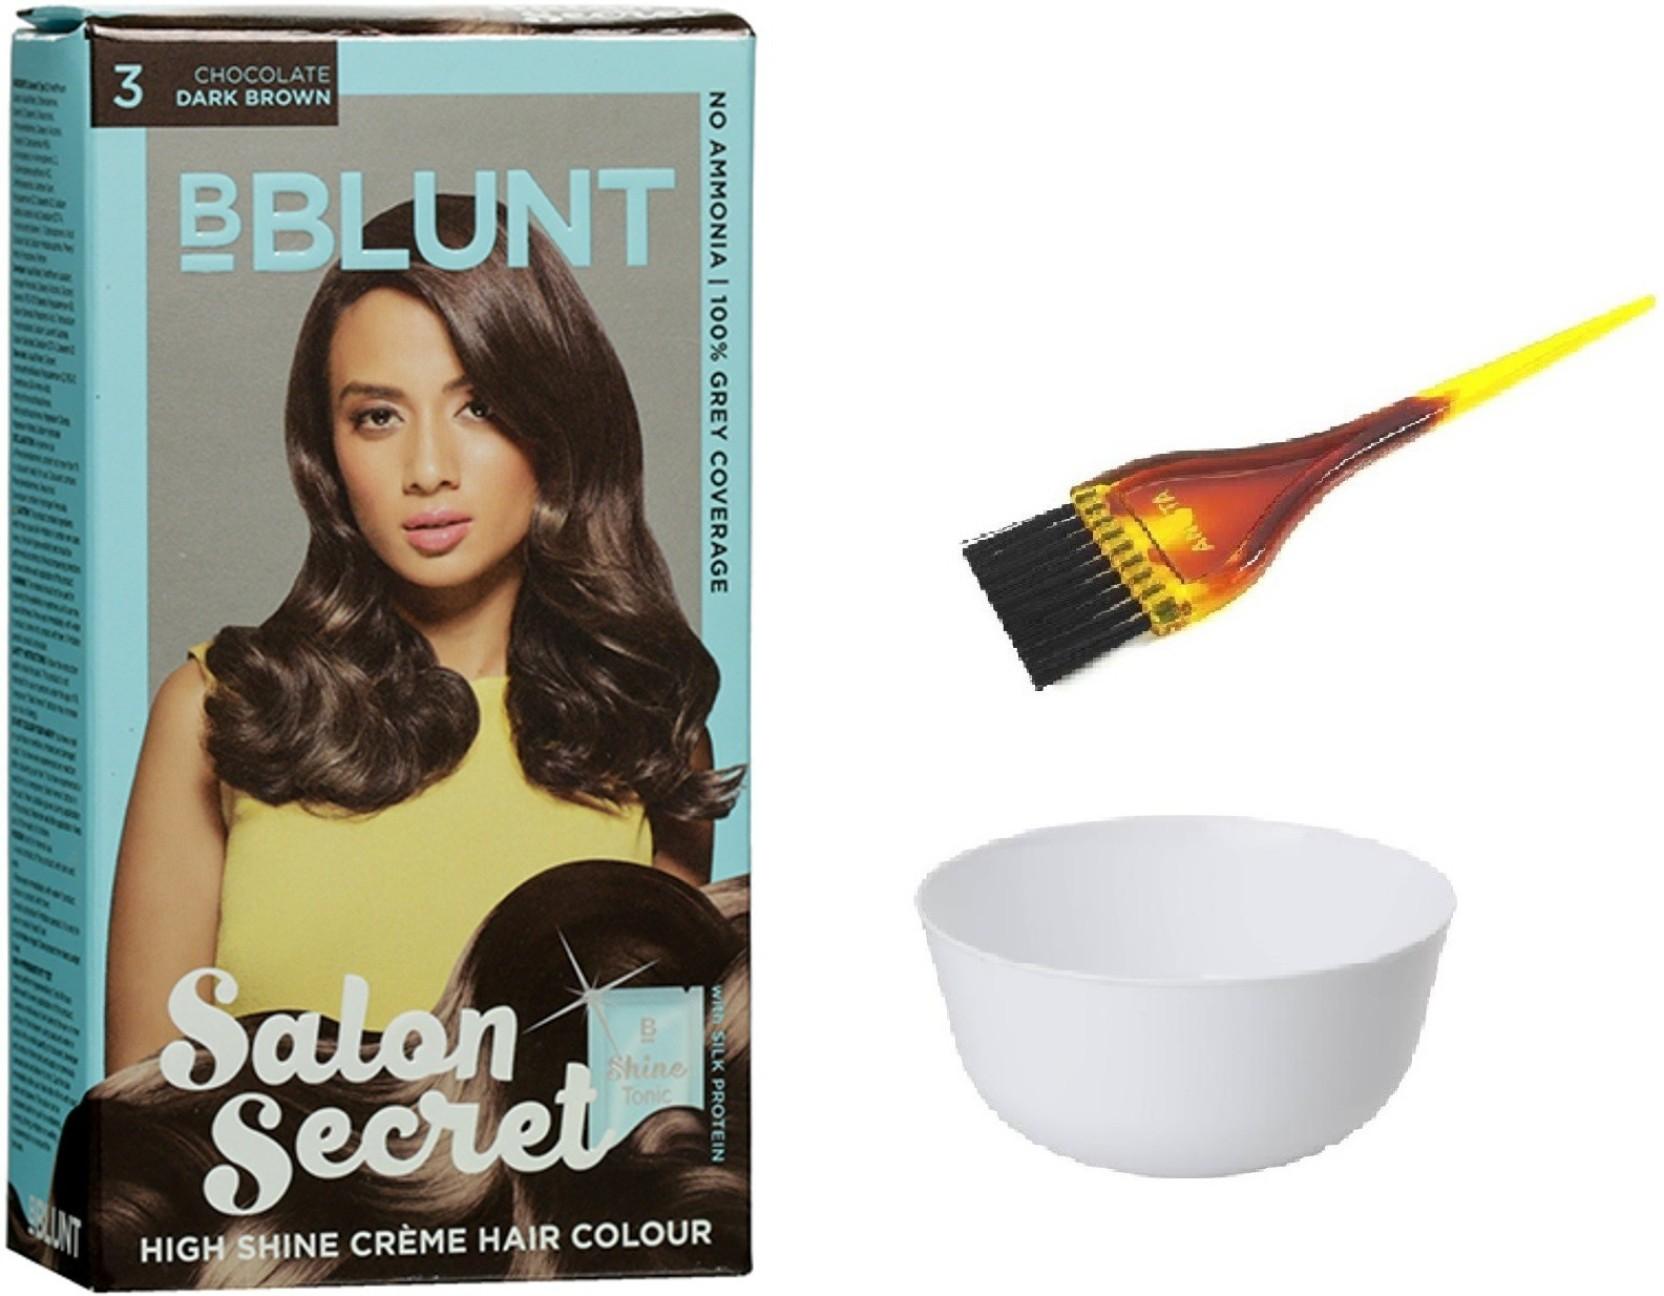 Bblunt Salon Secret High Shine Creme Hair Color 3 Chocolate Dark